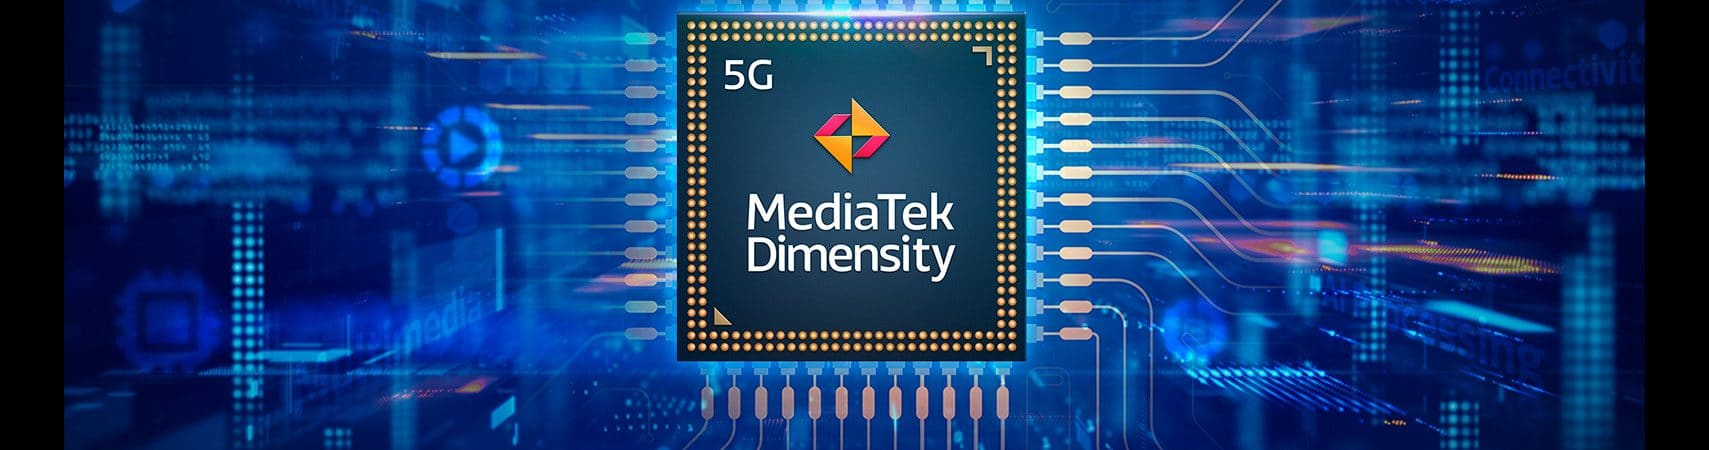 MediaTek apresenta linha de SoCs Dimensity 810 e 920. Divulgação: MediaTek